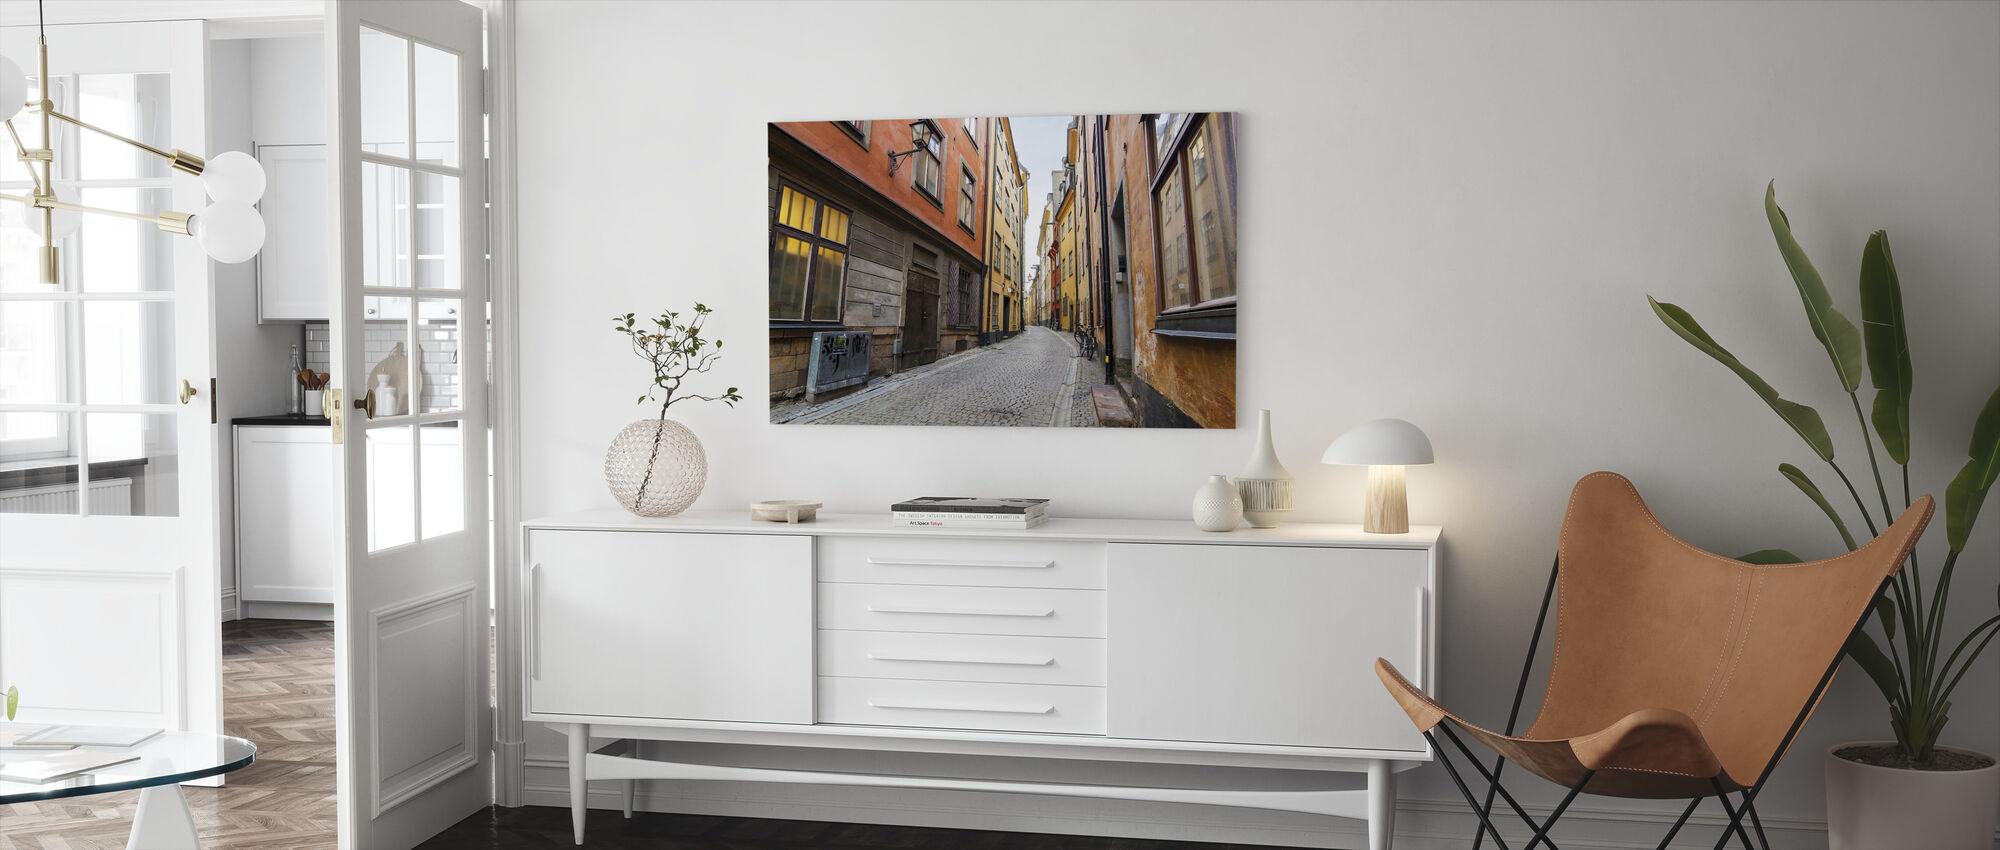 Street in Gamla Stan Stockholm - Canvas print - Living Room